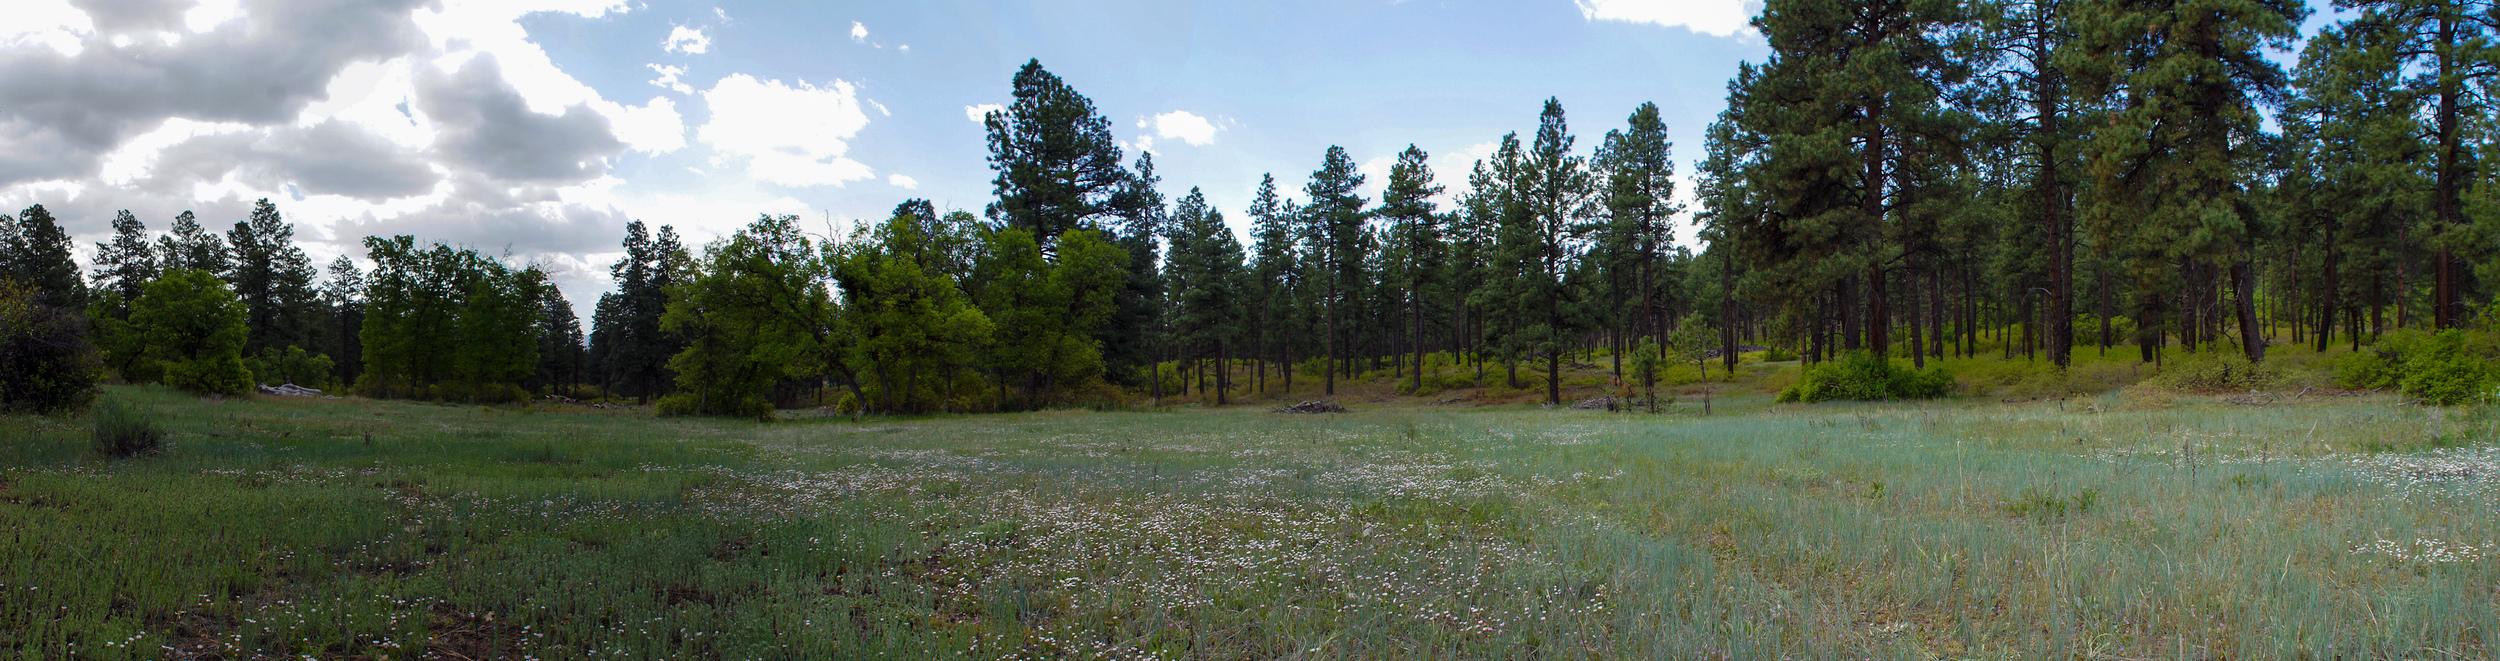 Pano - Eagles Ridge - 2252-63.jpg